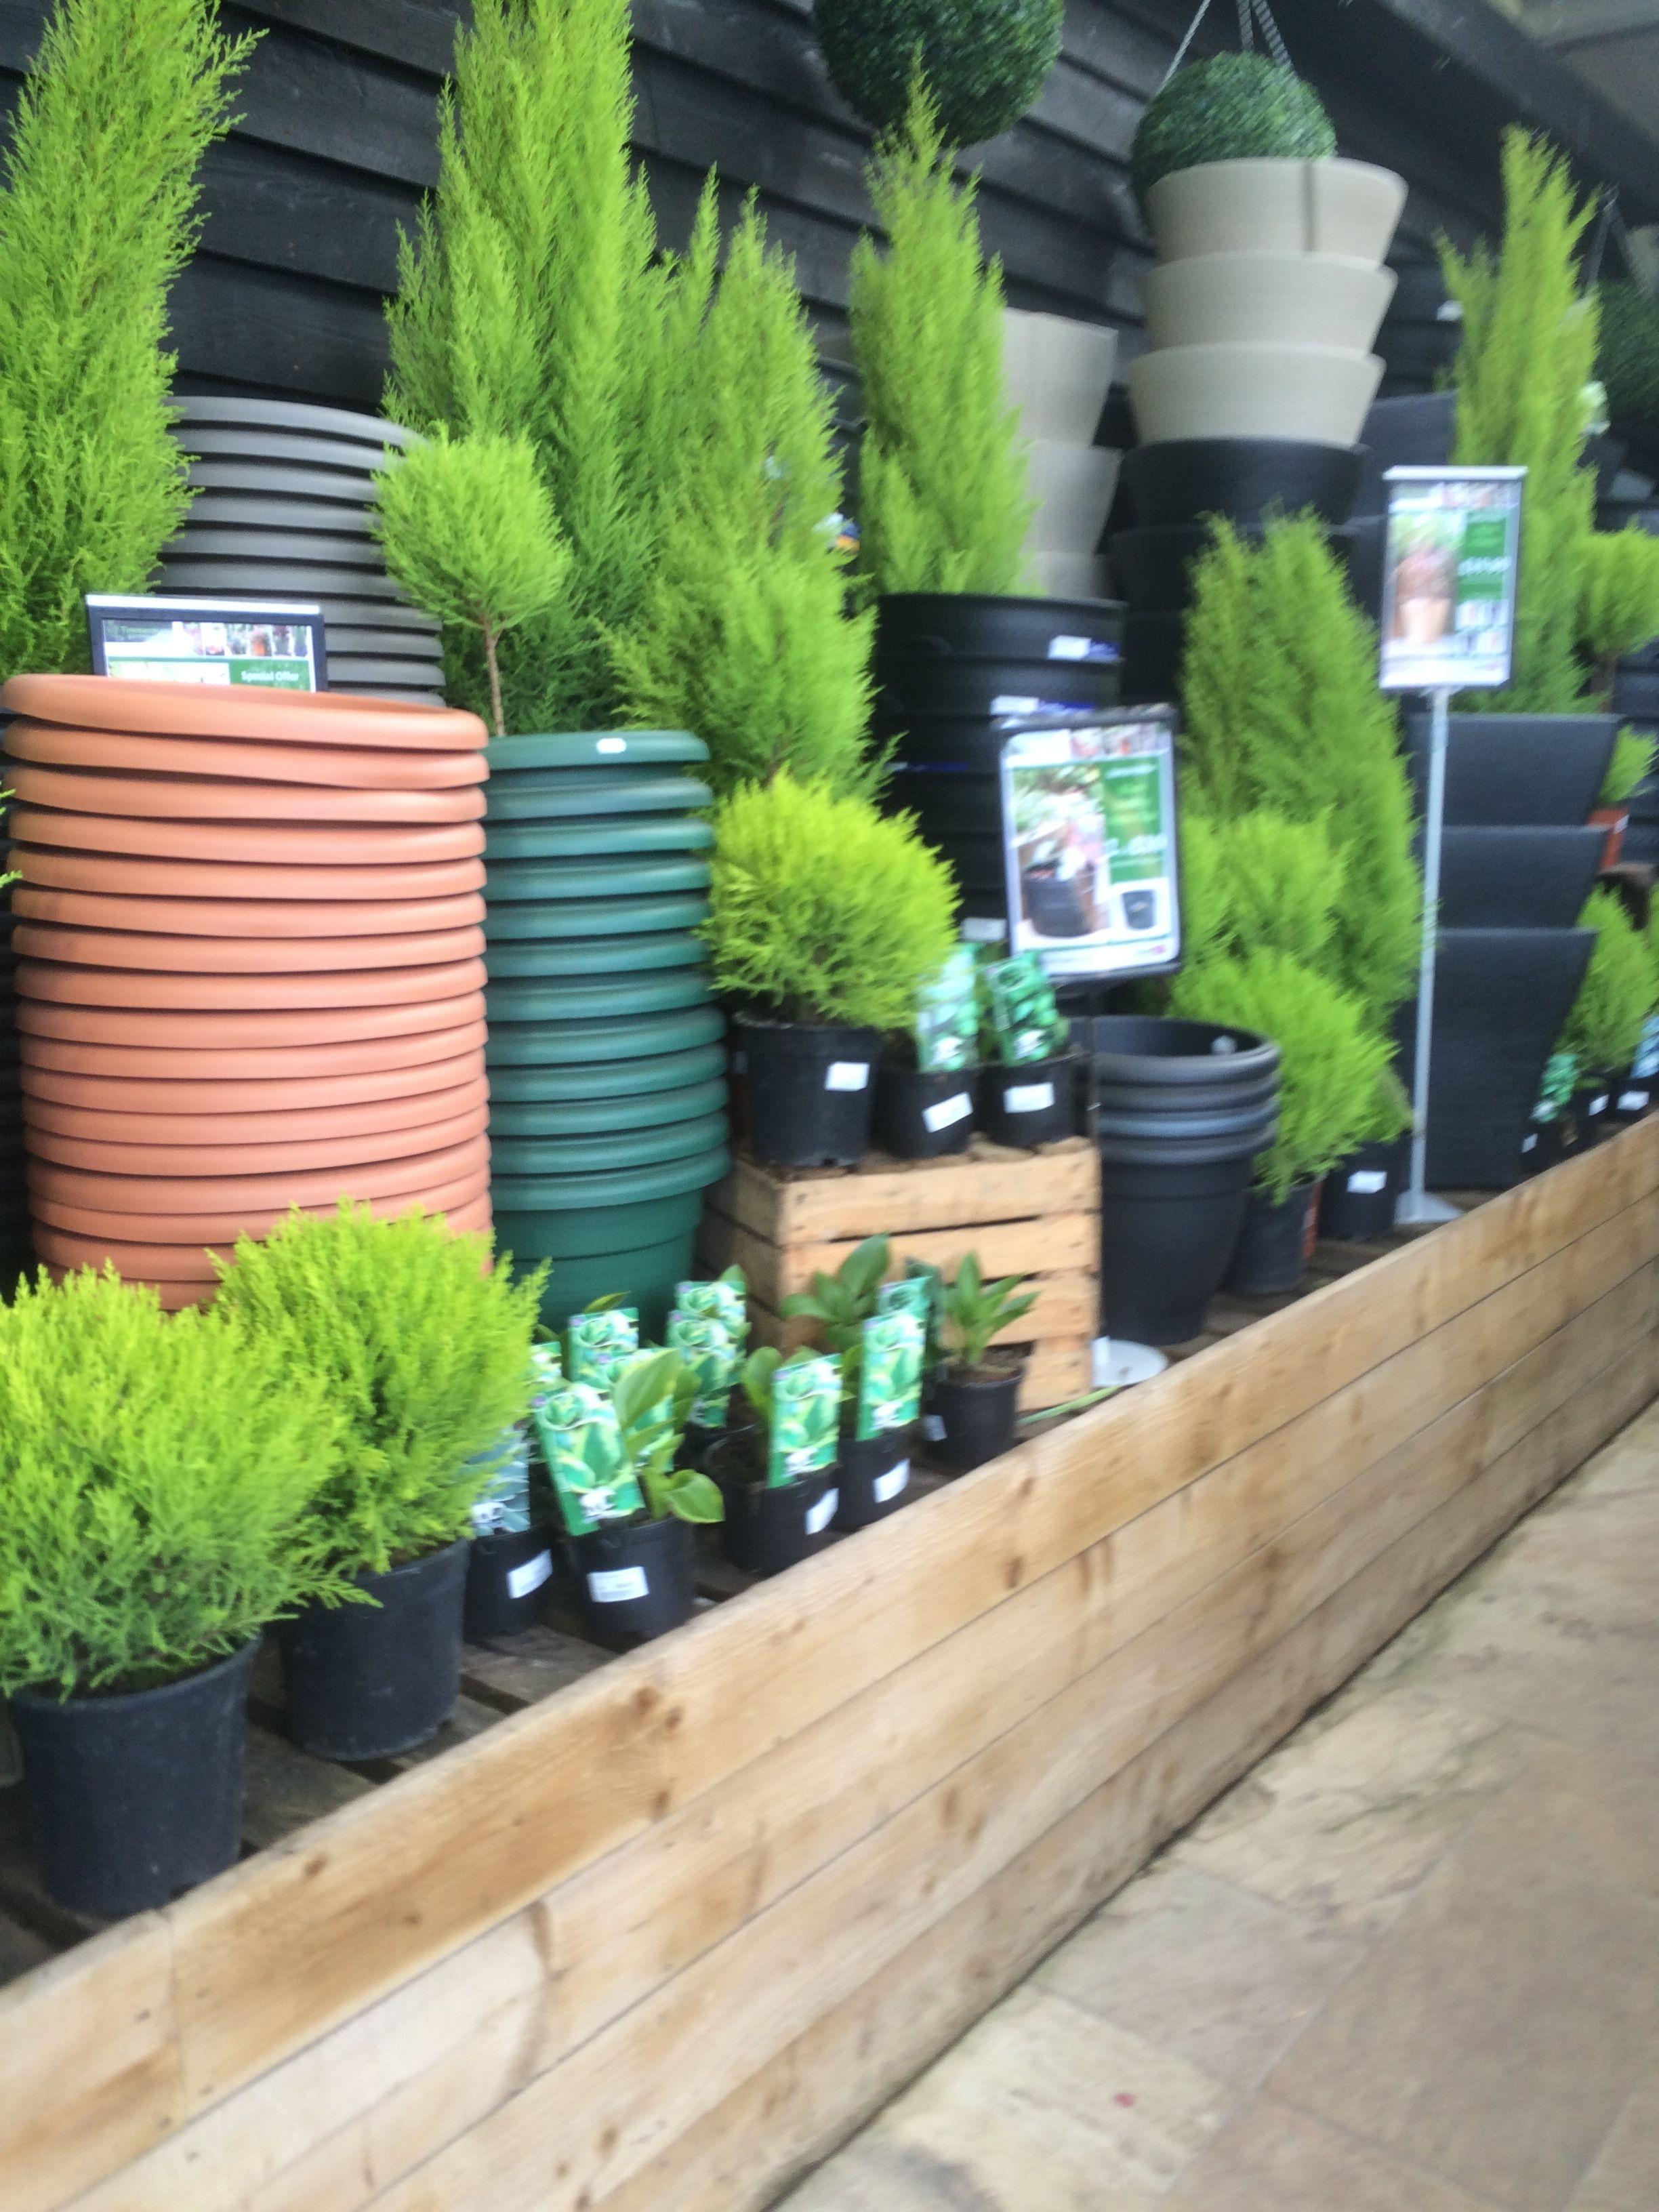 Timmermans Garden Centre Nursery Garden Outdoor Retail Home Lifestyle Plants Visual Merchandising Layout Landscape Www Clearretail ต นไม